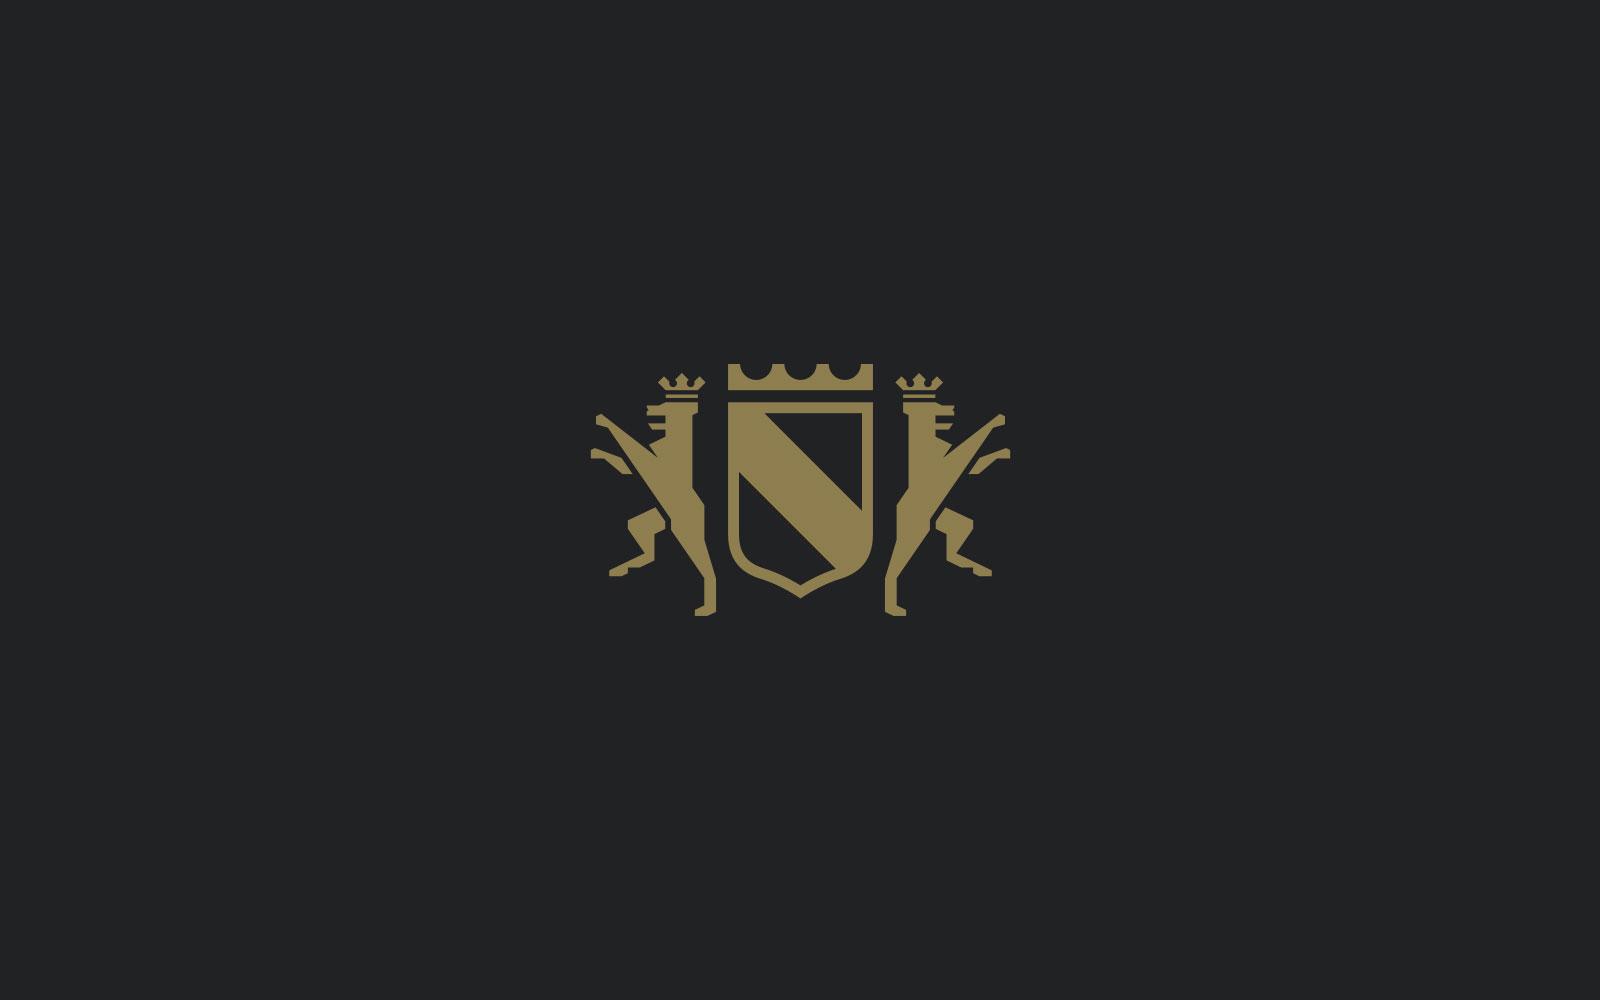 mcleod_1600p_logo_1